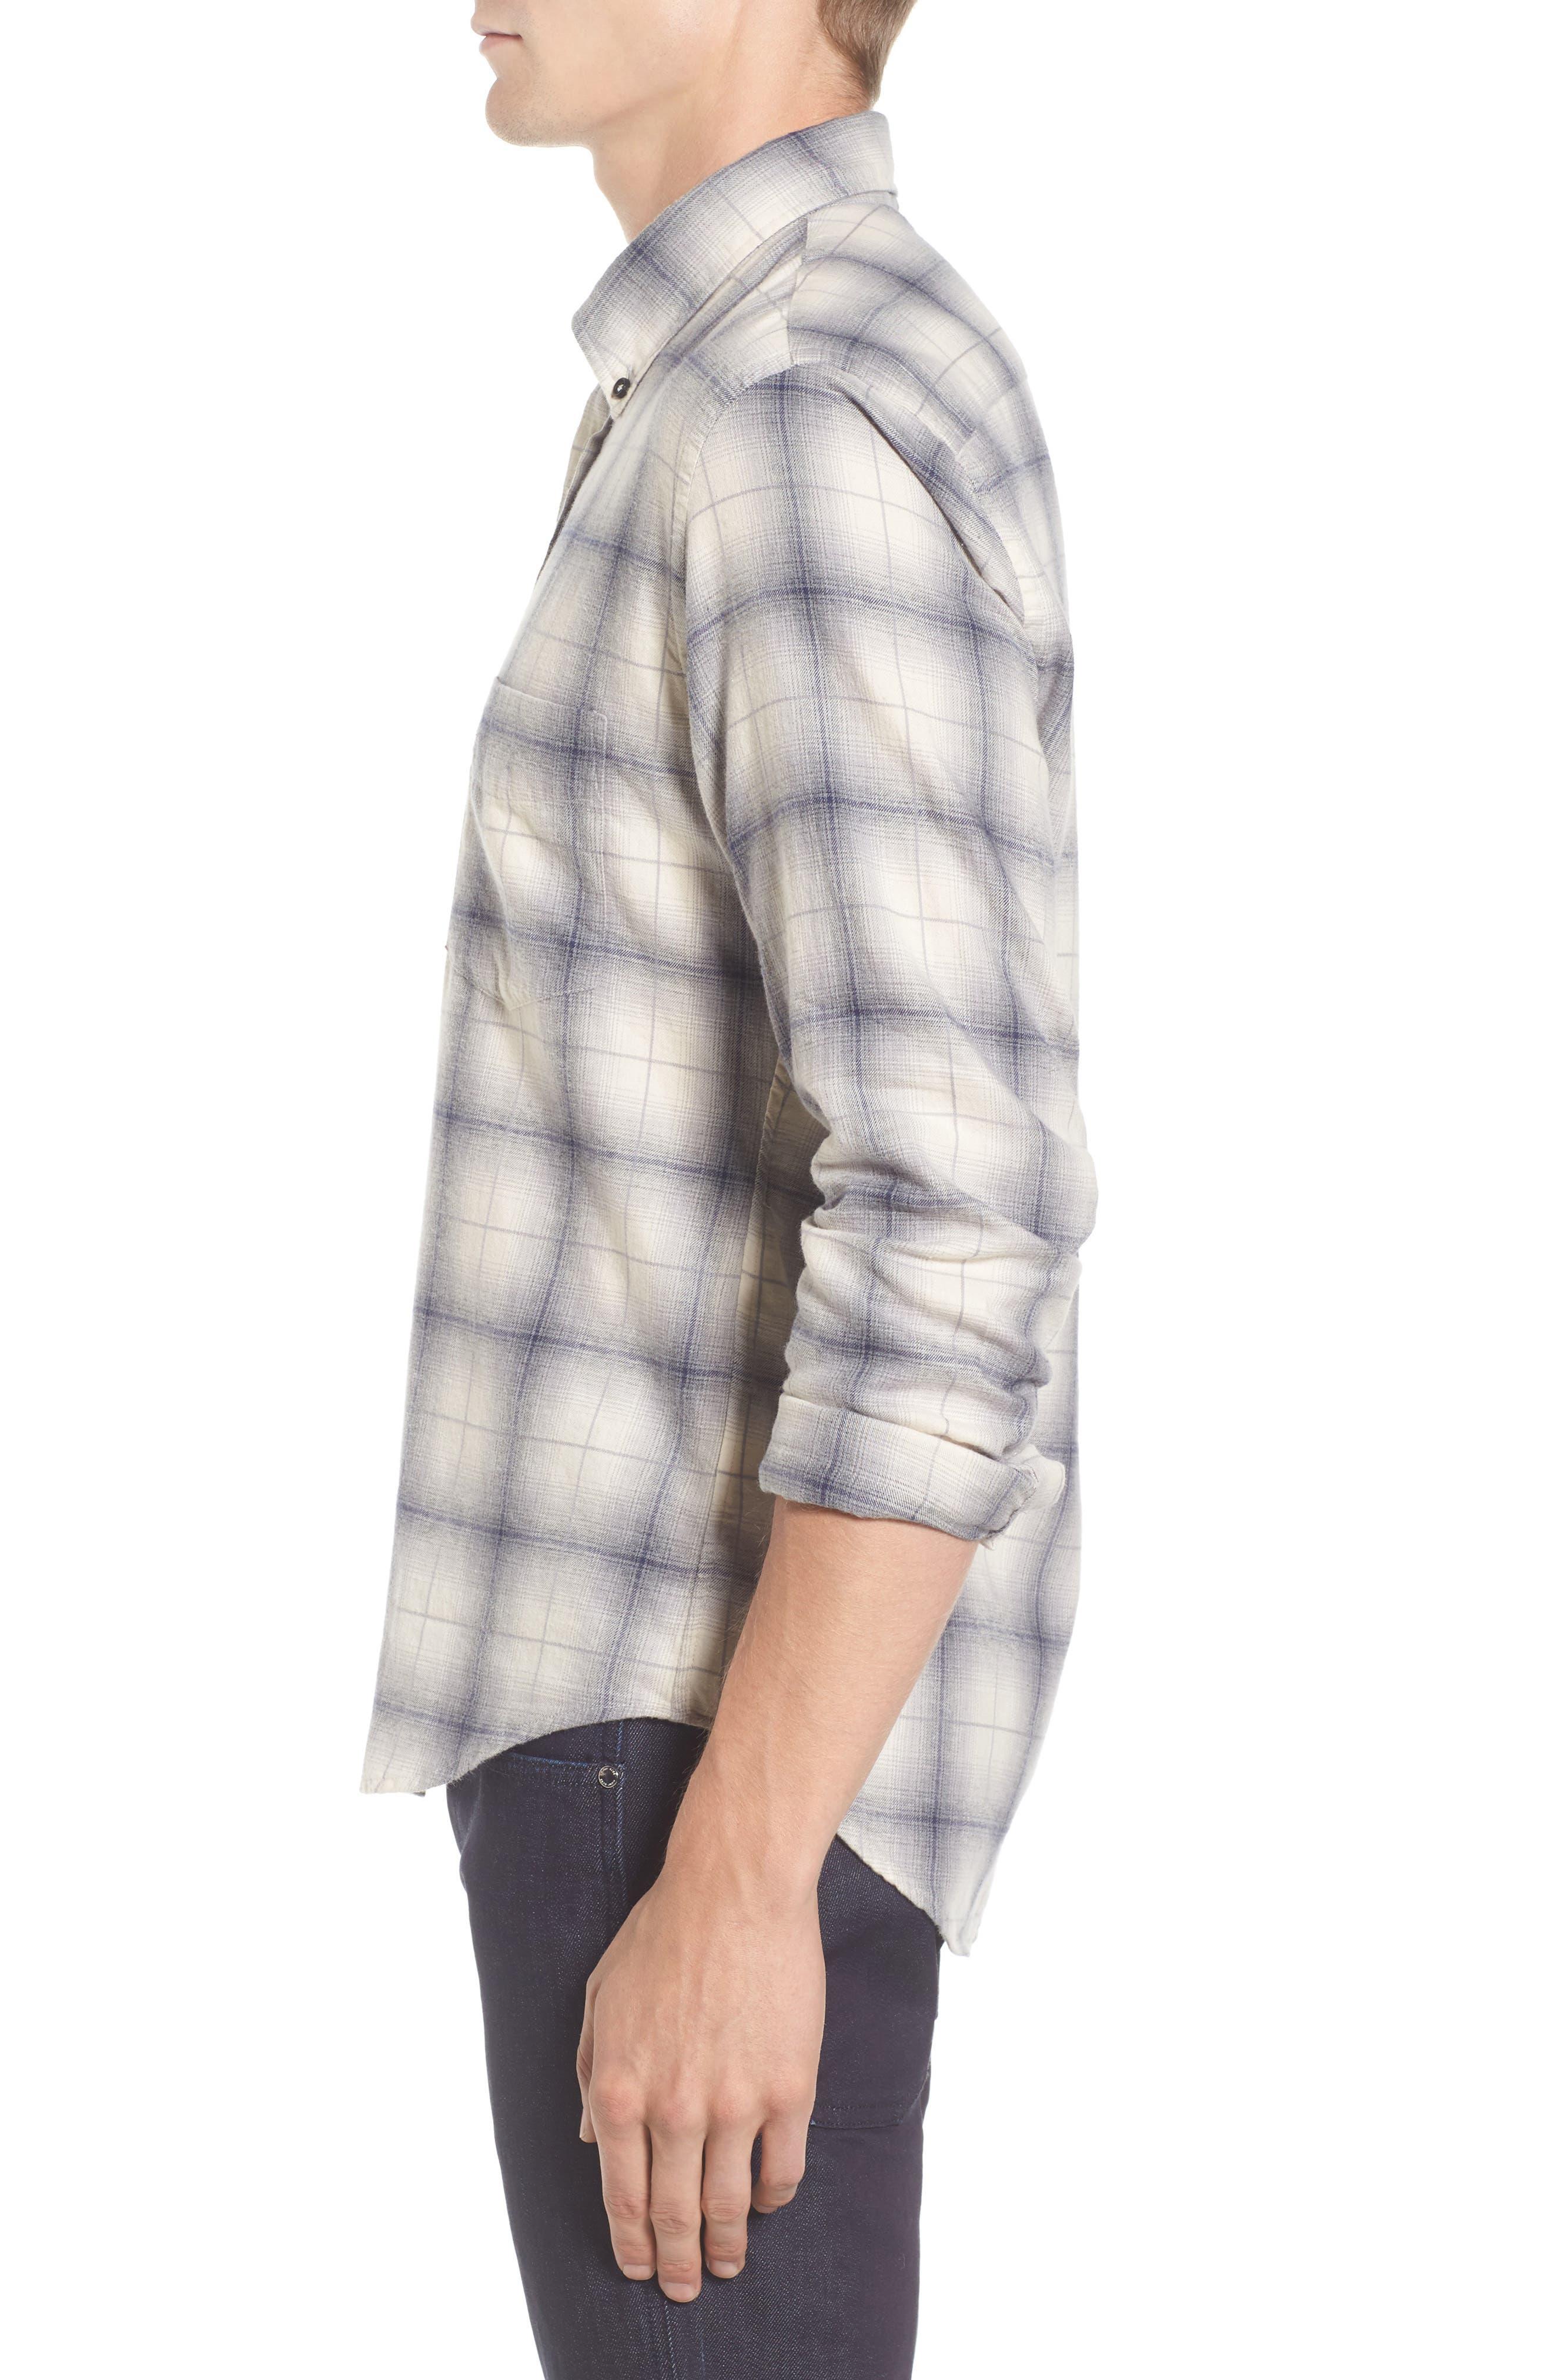 Kirby Slim Fit Plaid Flannel Shirt,                             Alternate thumbnail 3, color,                             Grey/ Blue